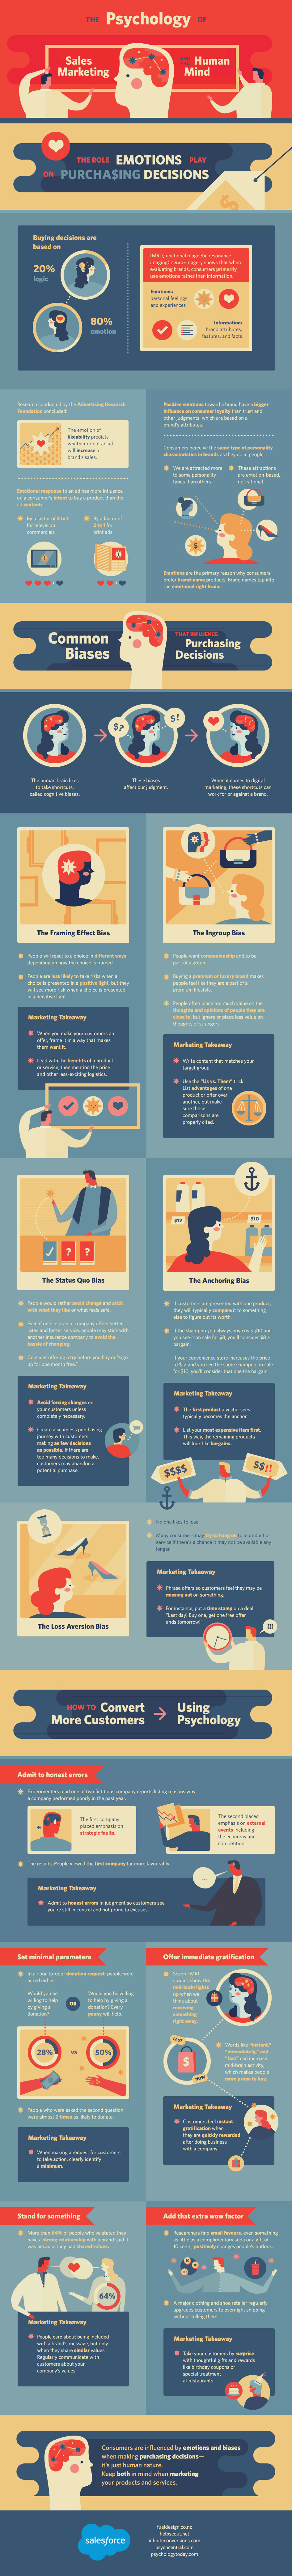 The Psychology of Sales Marketing